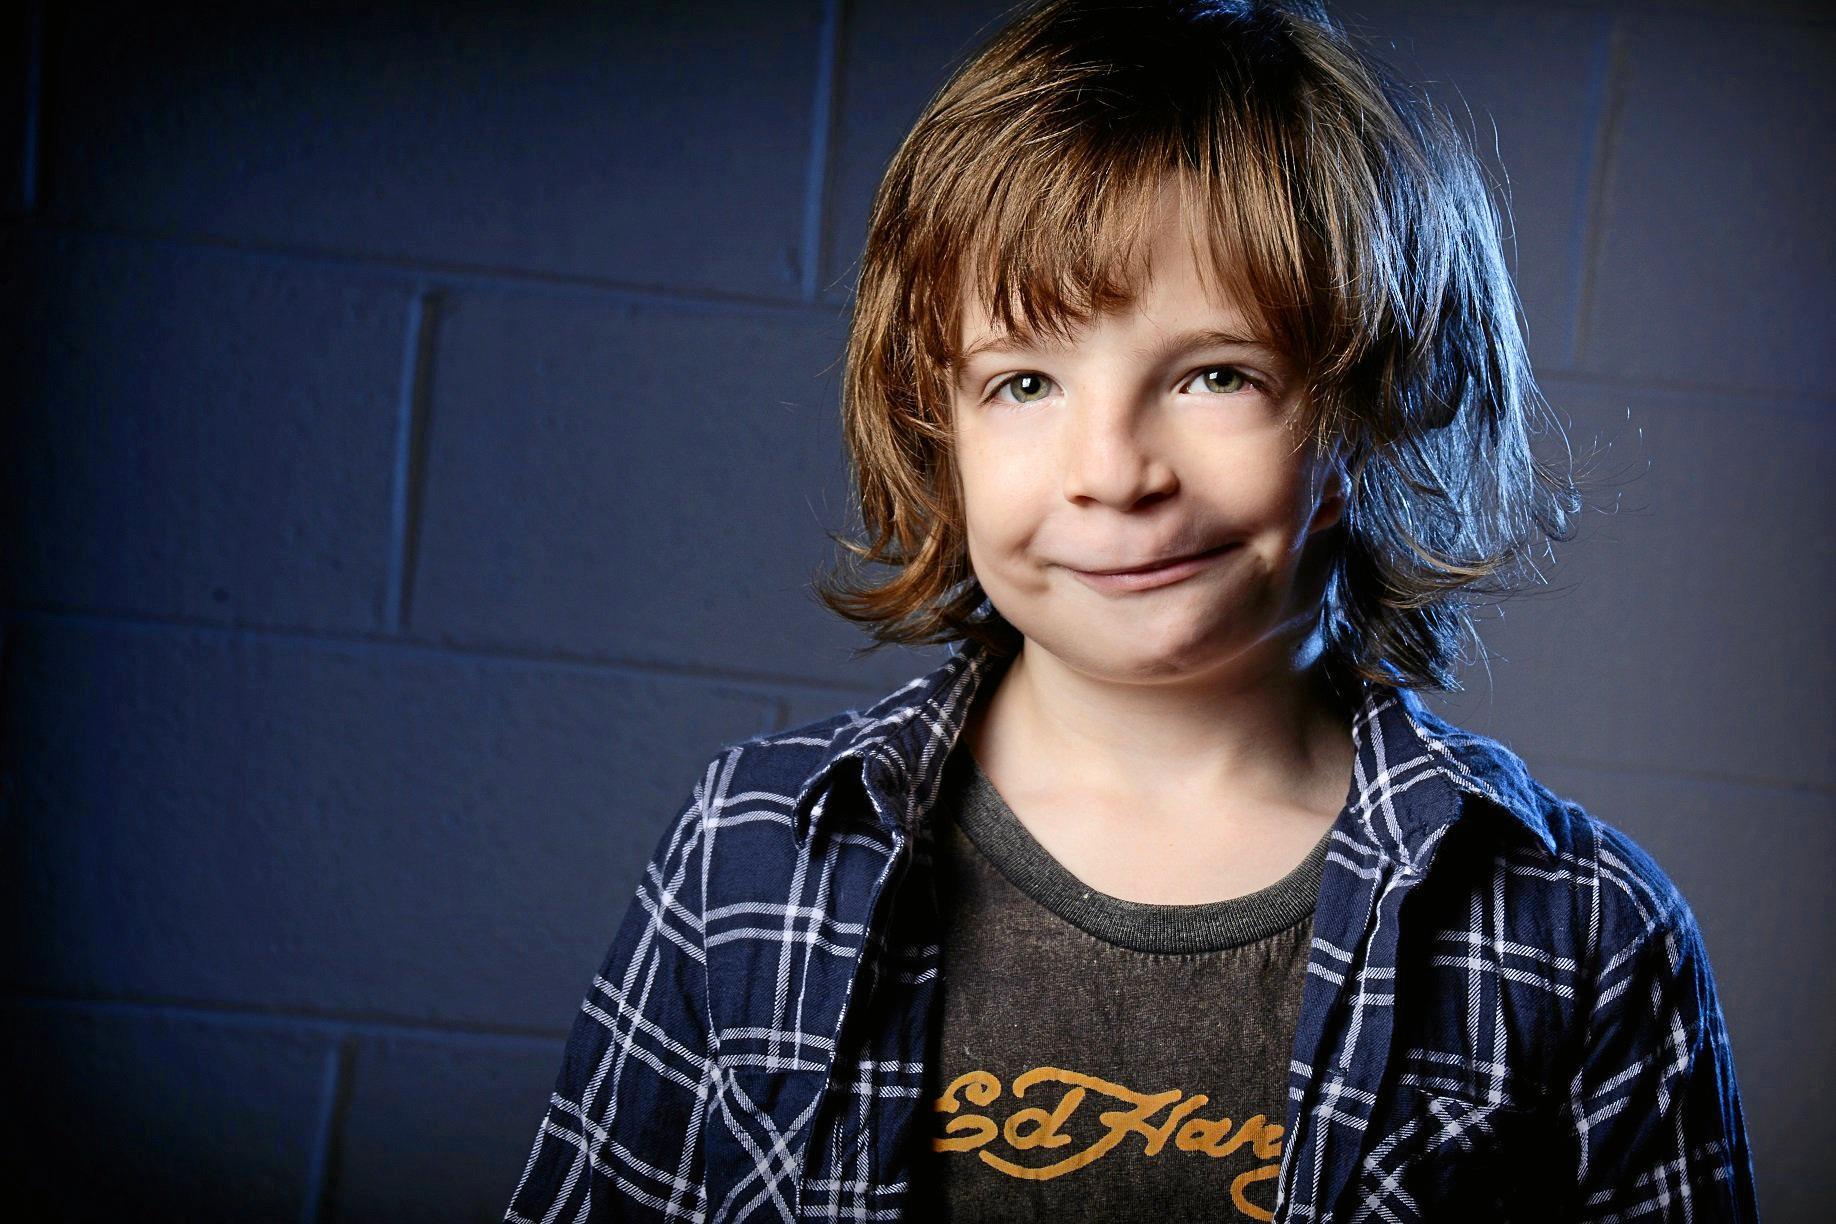 Edward Meskanen hopes to break down stigmas in the acting world to pursue his dream.